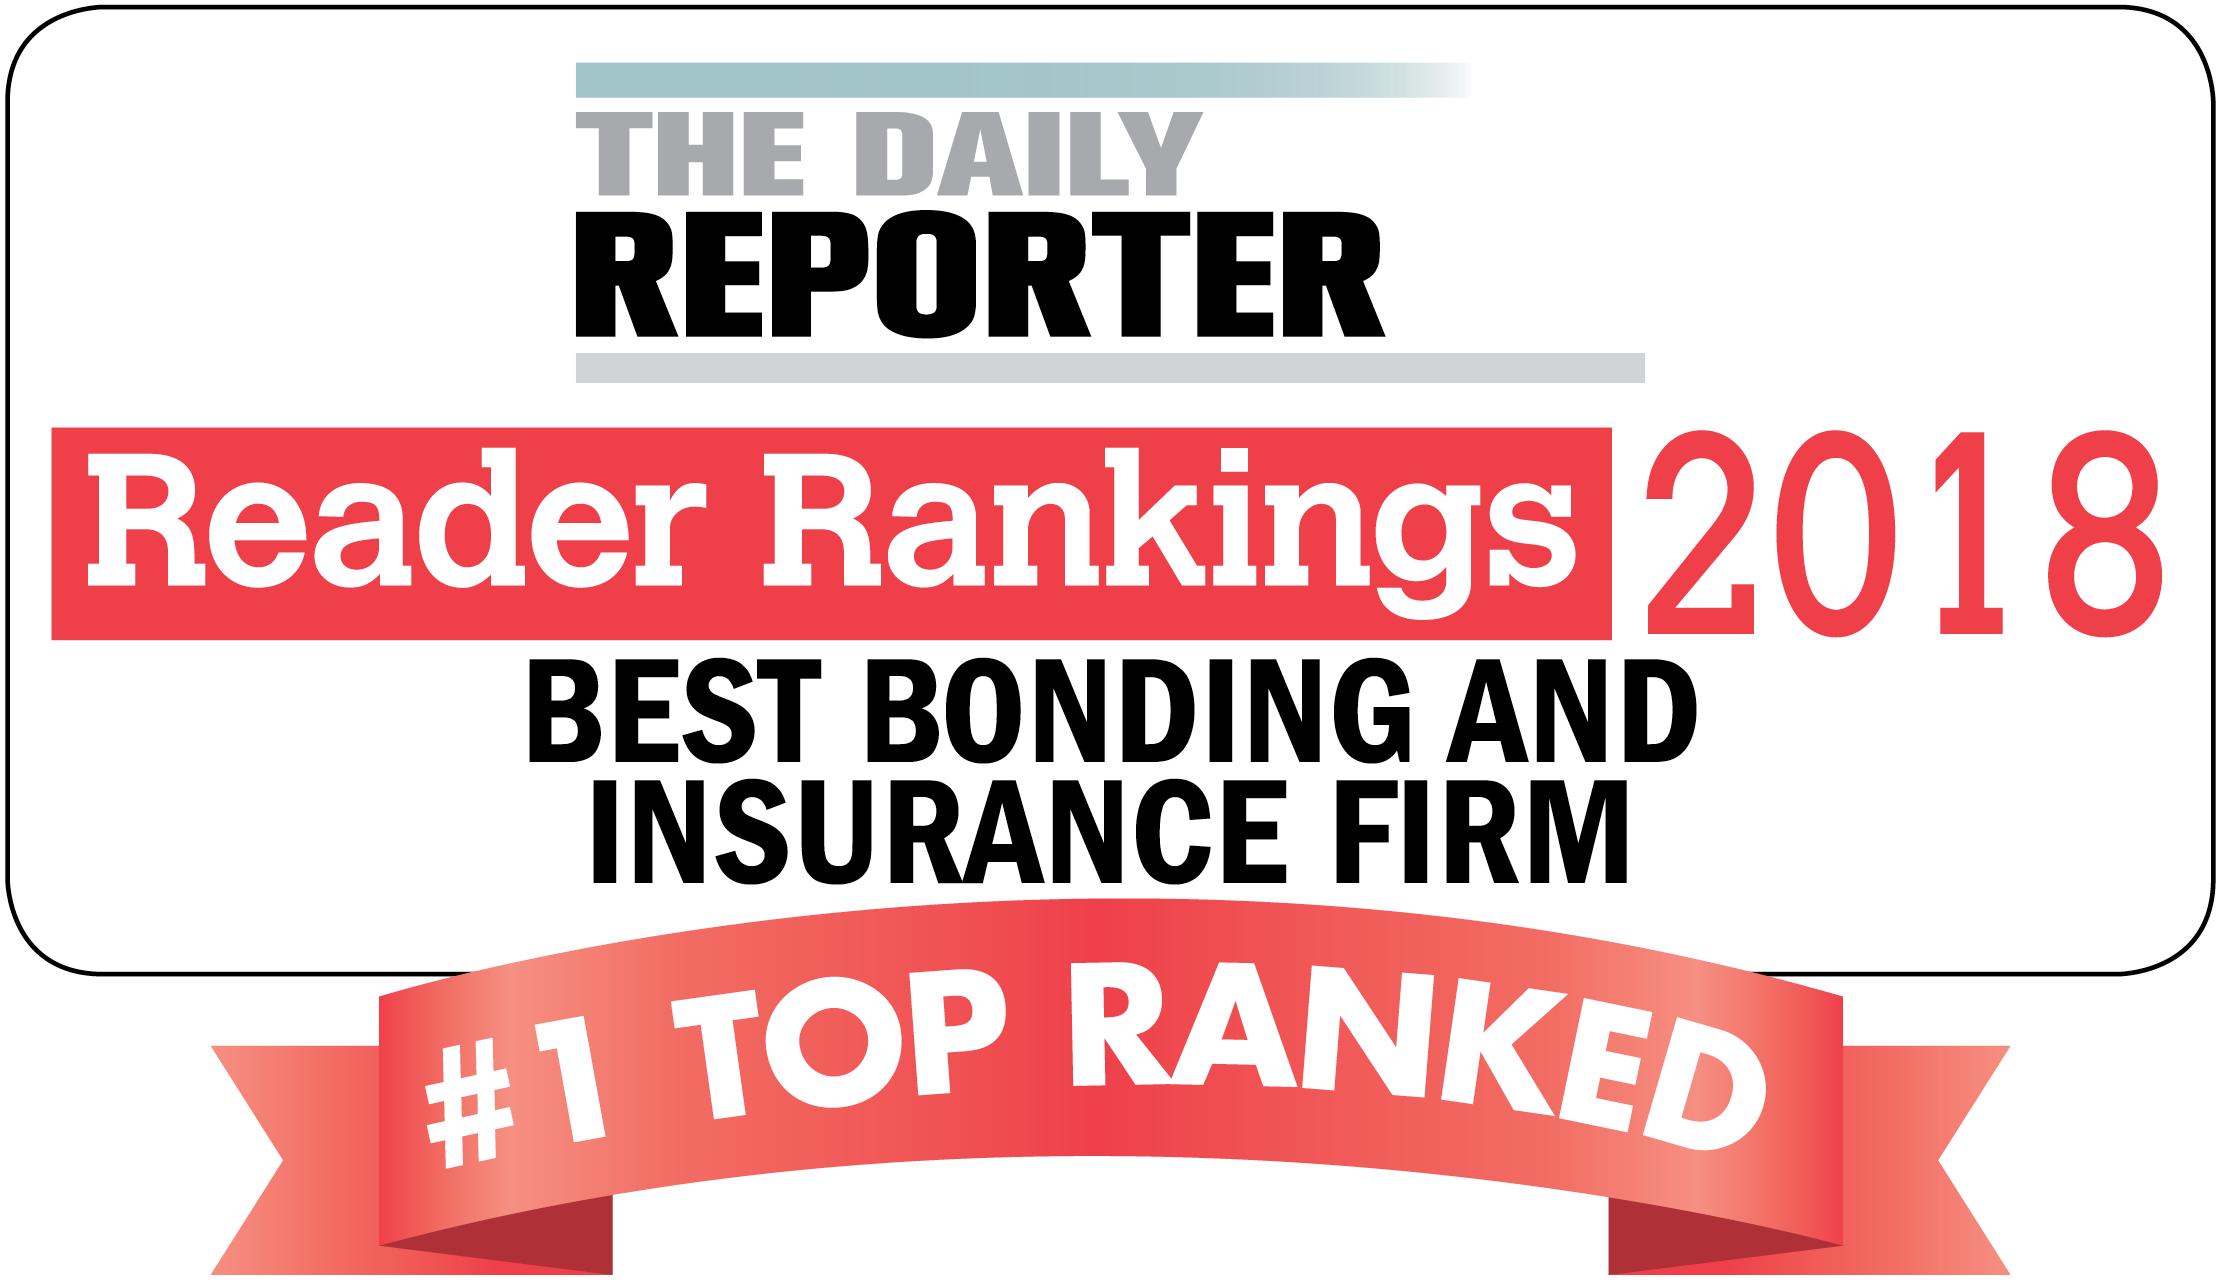 RR18 honoree #1 bonding_TDR.png